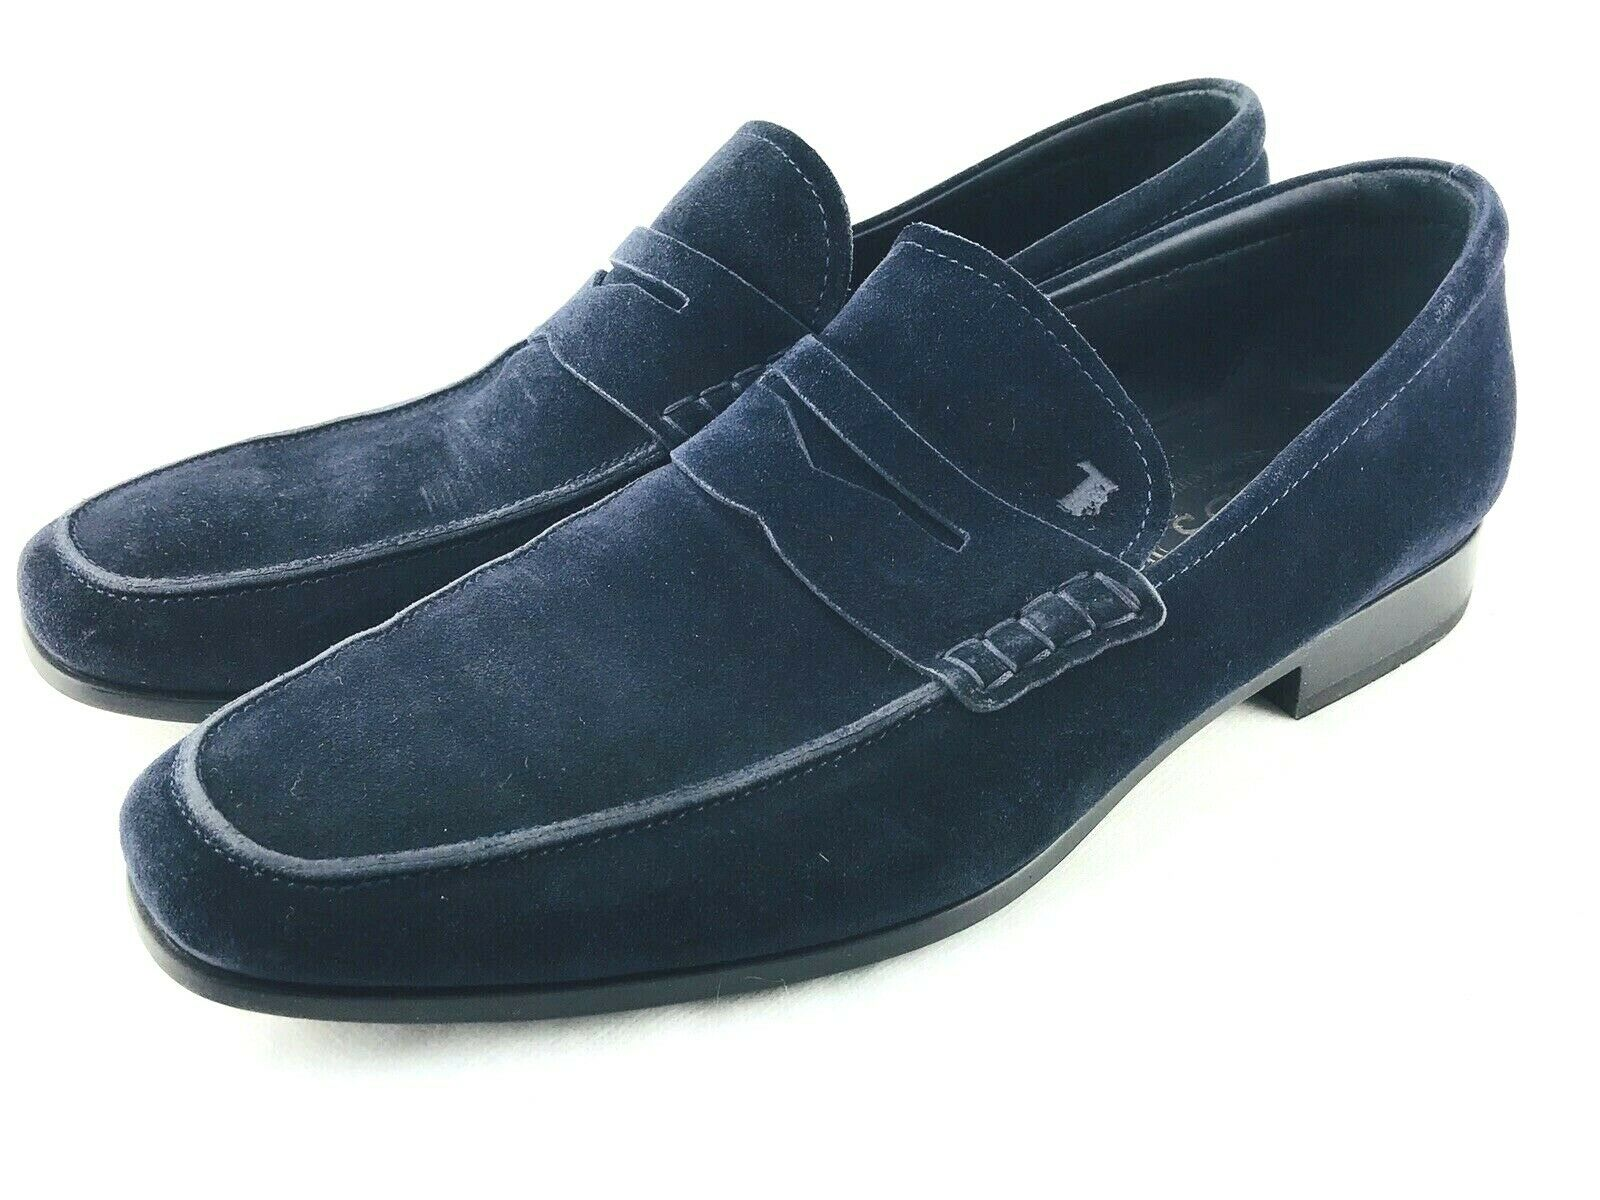 645 TODS herren Suede Penny Loafers Navy Blau unterhose On 8.5 Casual Dress schuhe 9.5